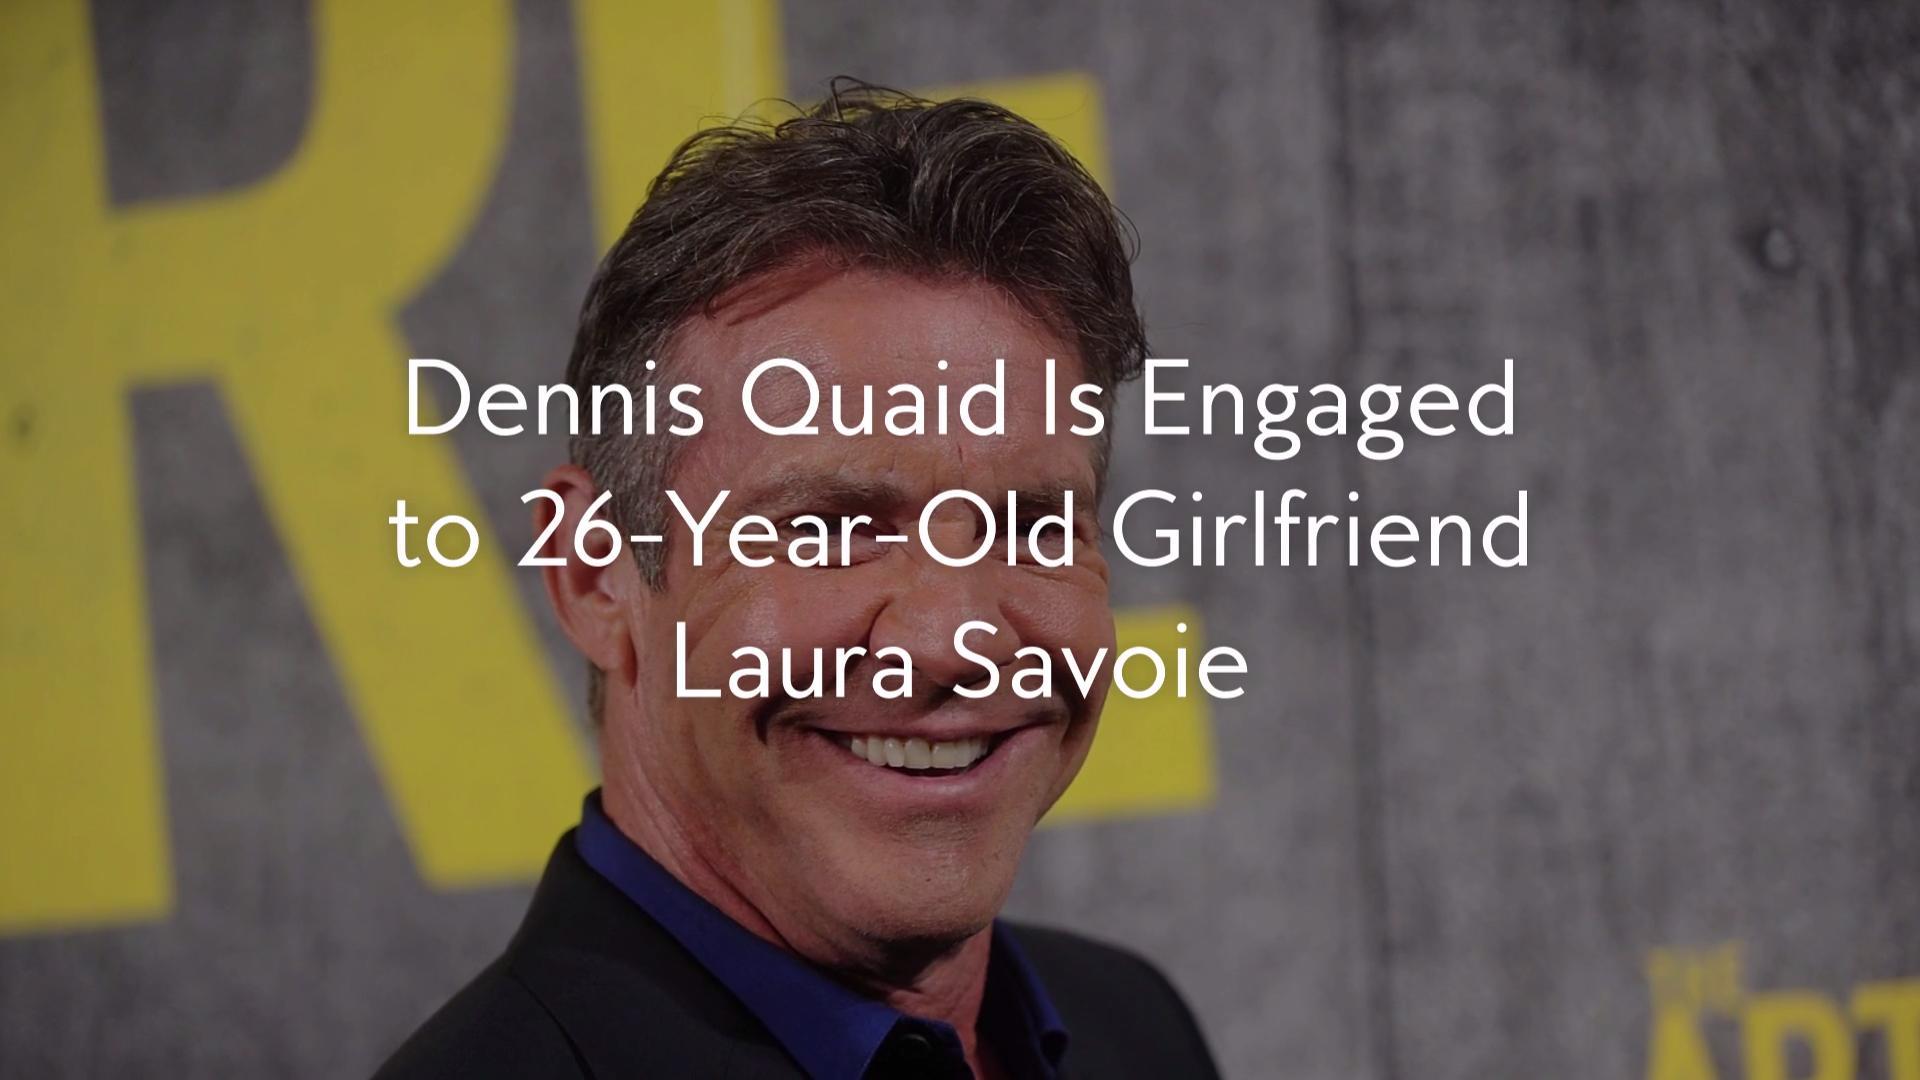 Elaine Hendrix AKA 'The Parent Trap' Stepmom-To-Be Threw Shade At Dennis Quaid